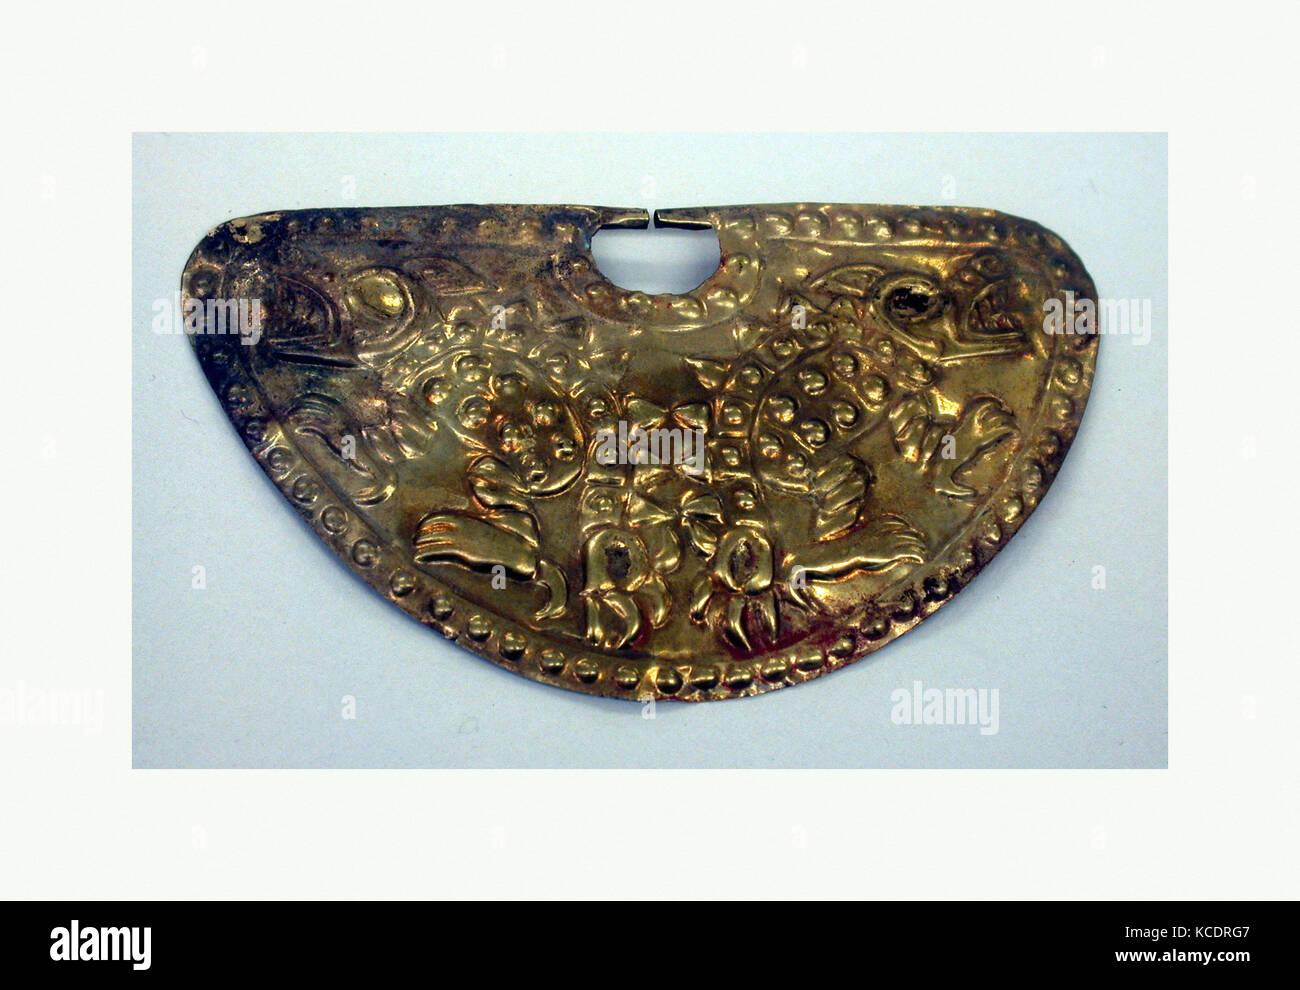 Nose Ornament, 390–450, Peru, Moche (Loma Negra), Gold, H. 2 1/4 x W. 3 7/8 x D. 1/4 in. (5.7 x 9.8 x 0.6 cm), Metal - Stock Image